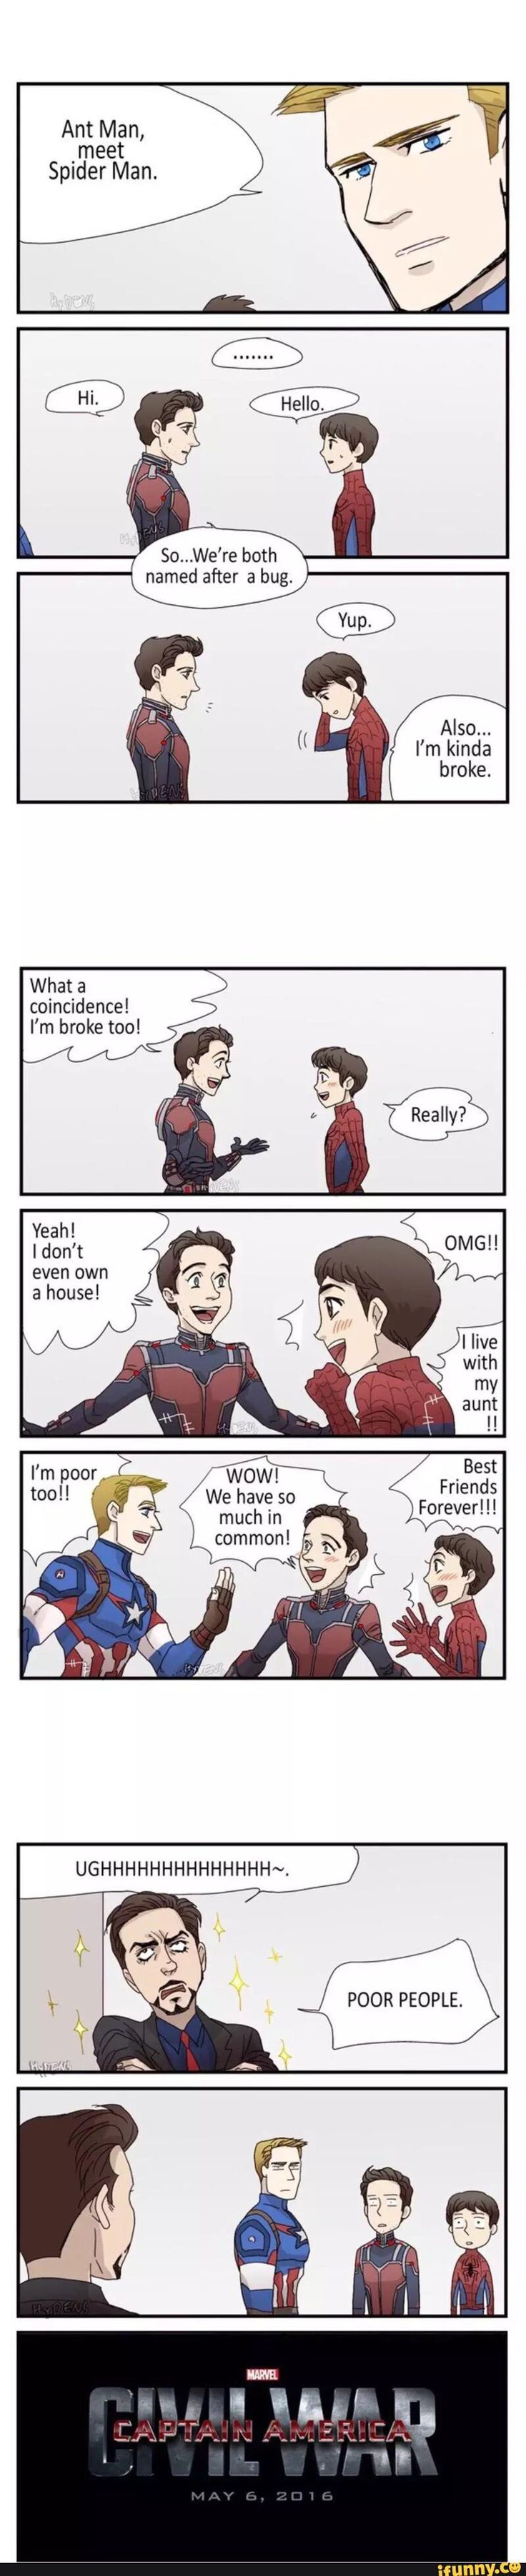 i prefer the other spiderman (from spiderman 2) TTuTT (Geek Stuff Marvel)